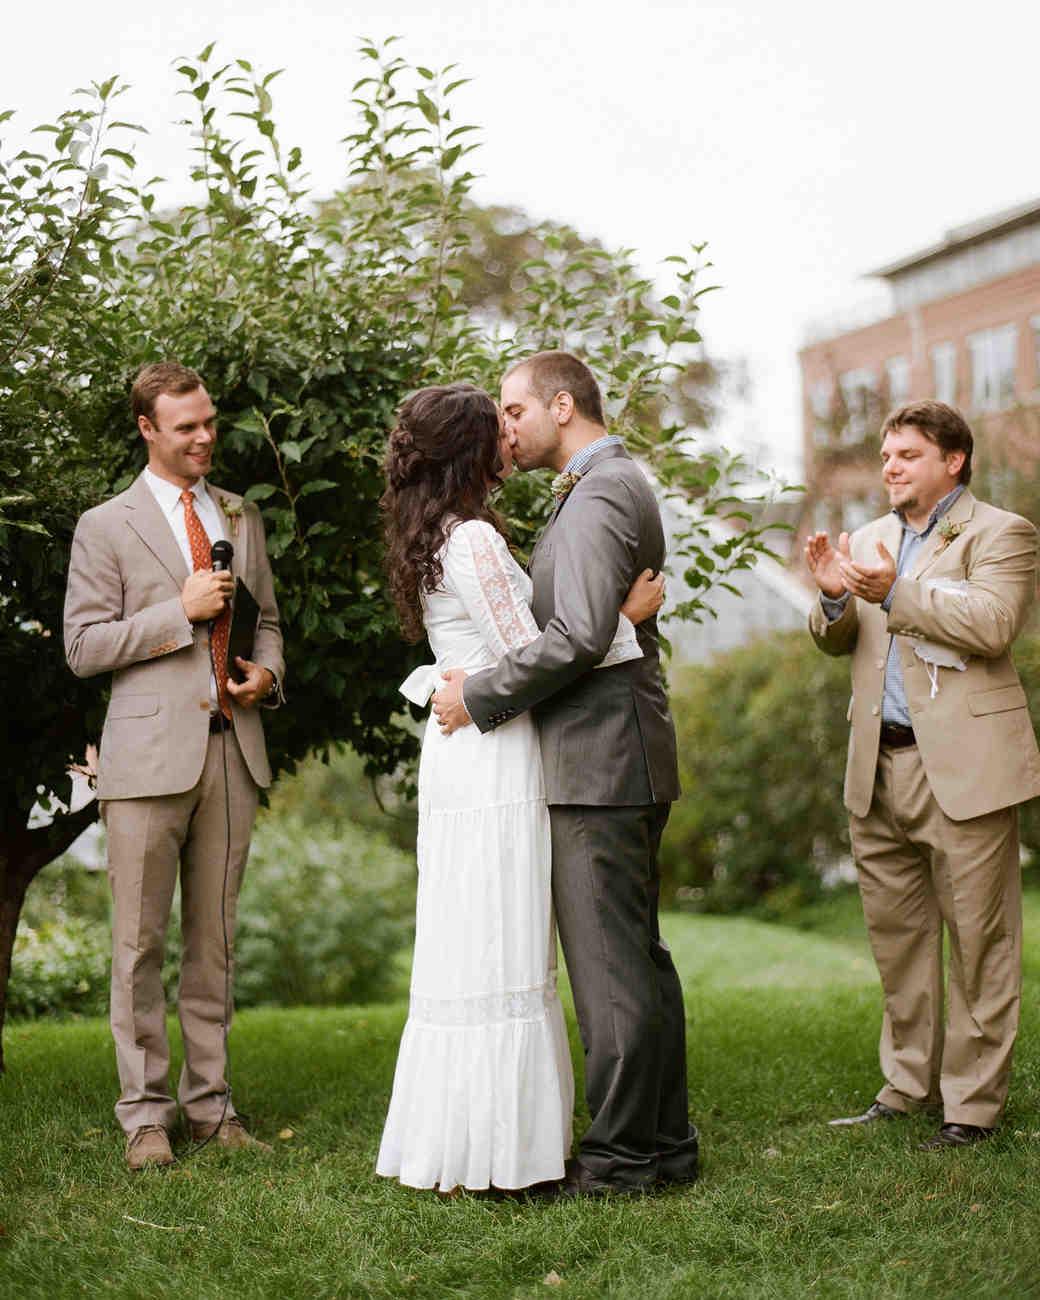 Wedding Etiquette What to Wear